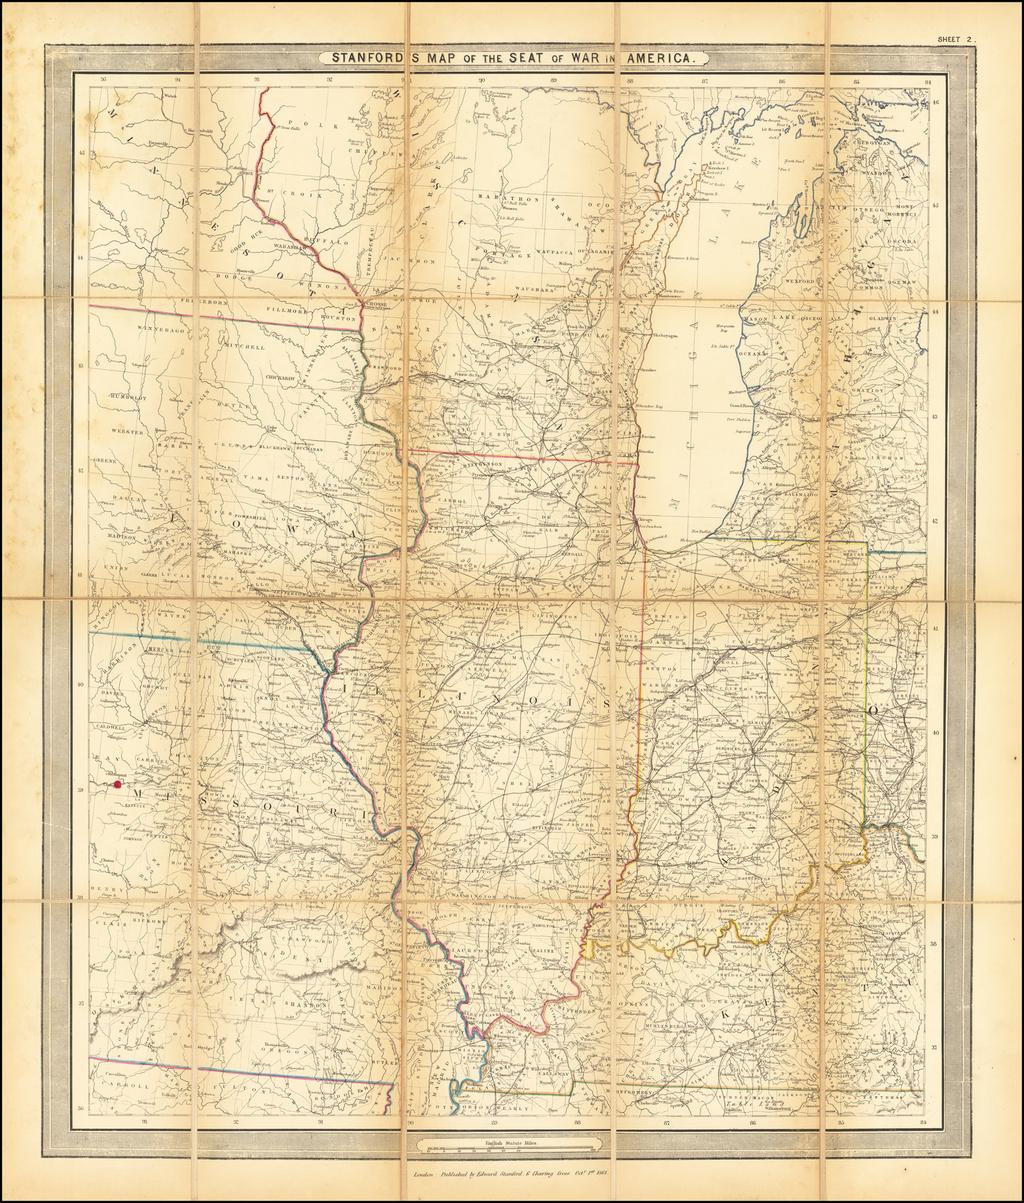 Stanford's Map of the Seat of War in America (Wisconsin, Michigan, Iowa, Illinois, Indiana, Kentucky, Missouri, Minnesota By Edward Stanford